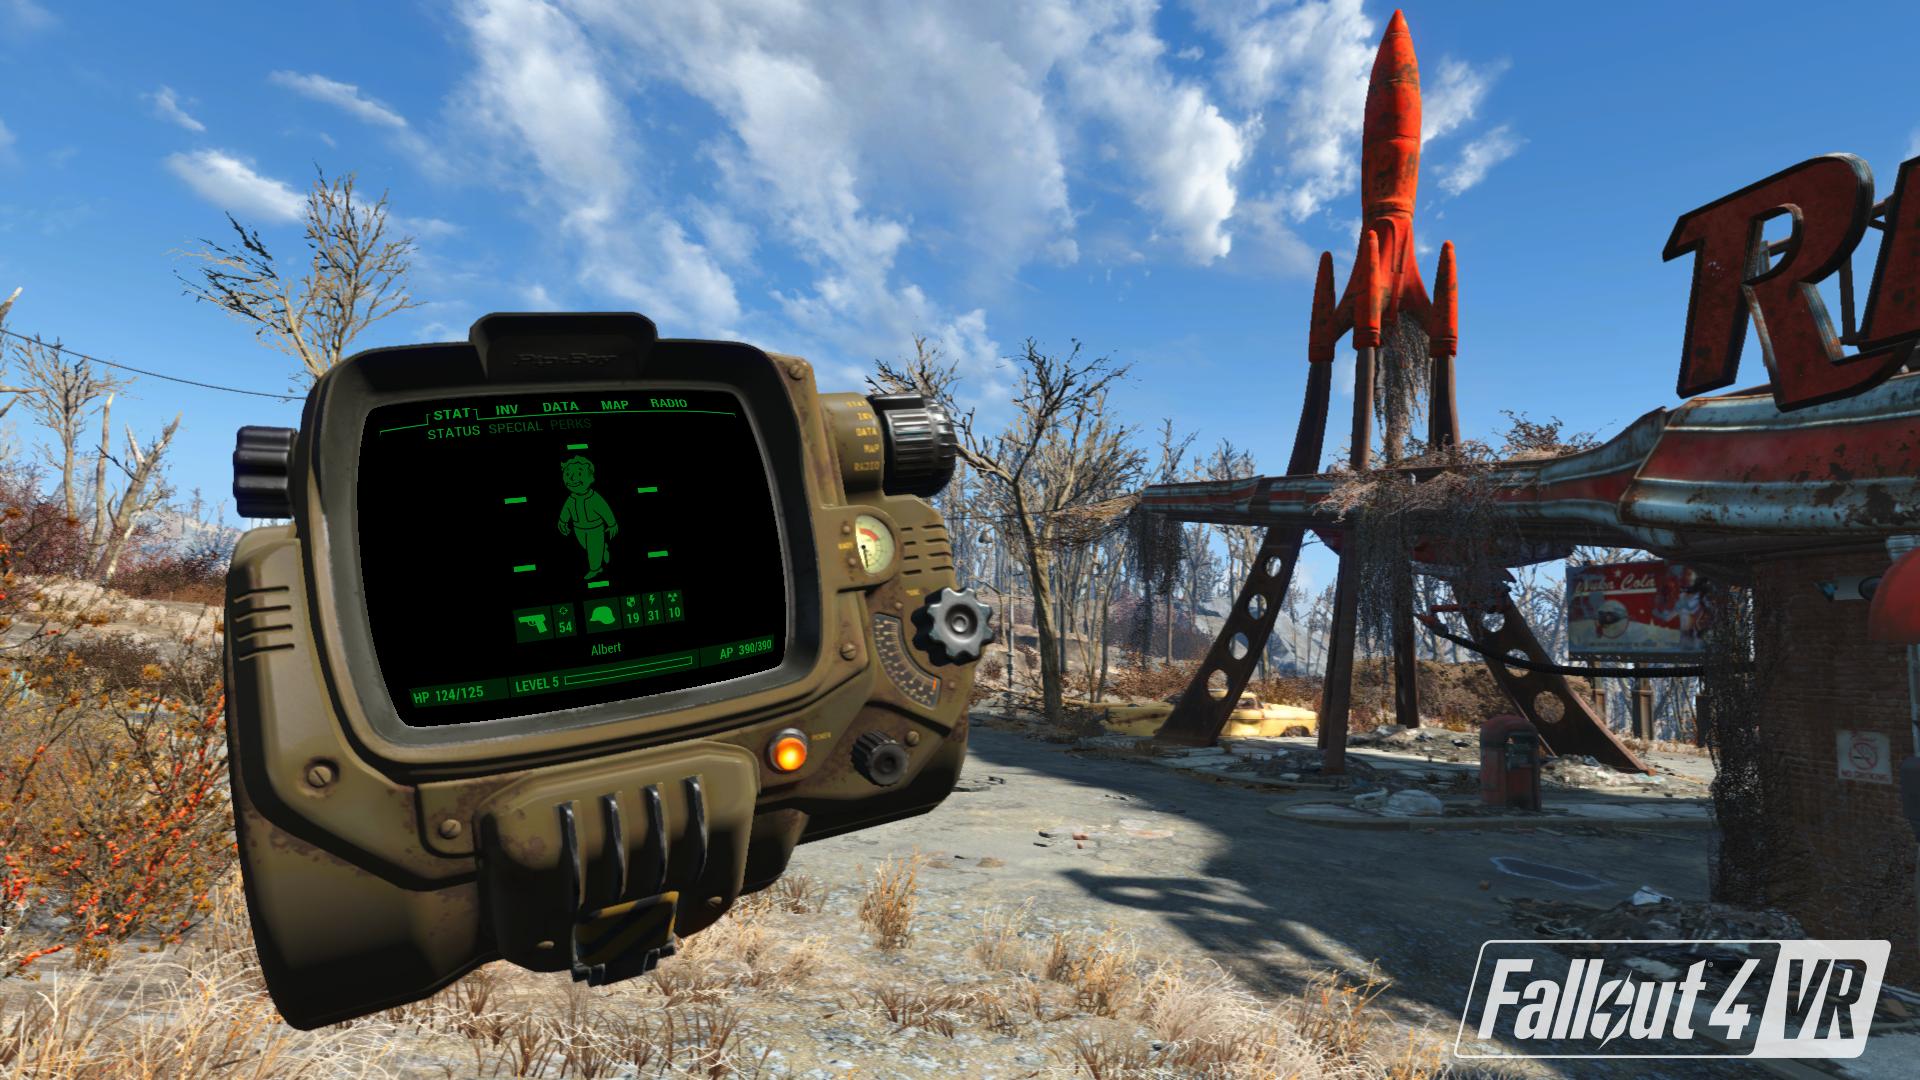 Fallout 4 VR Pip Boy watermark 1497052476